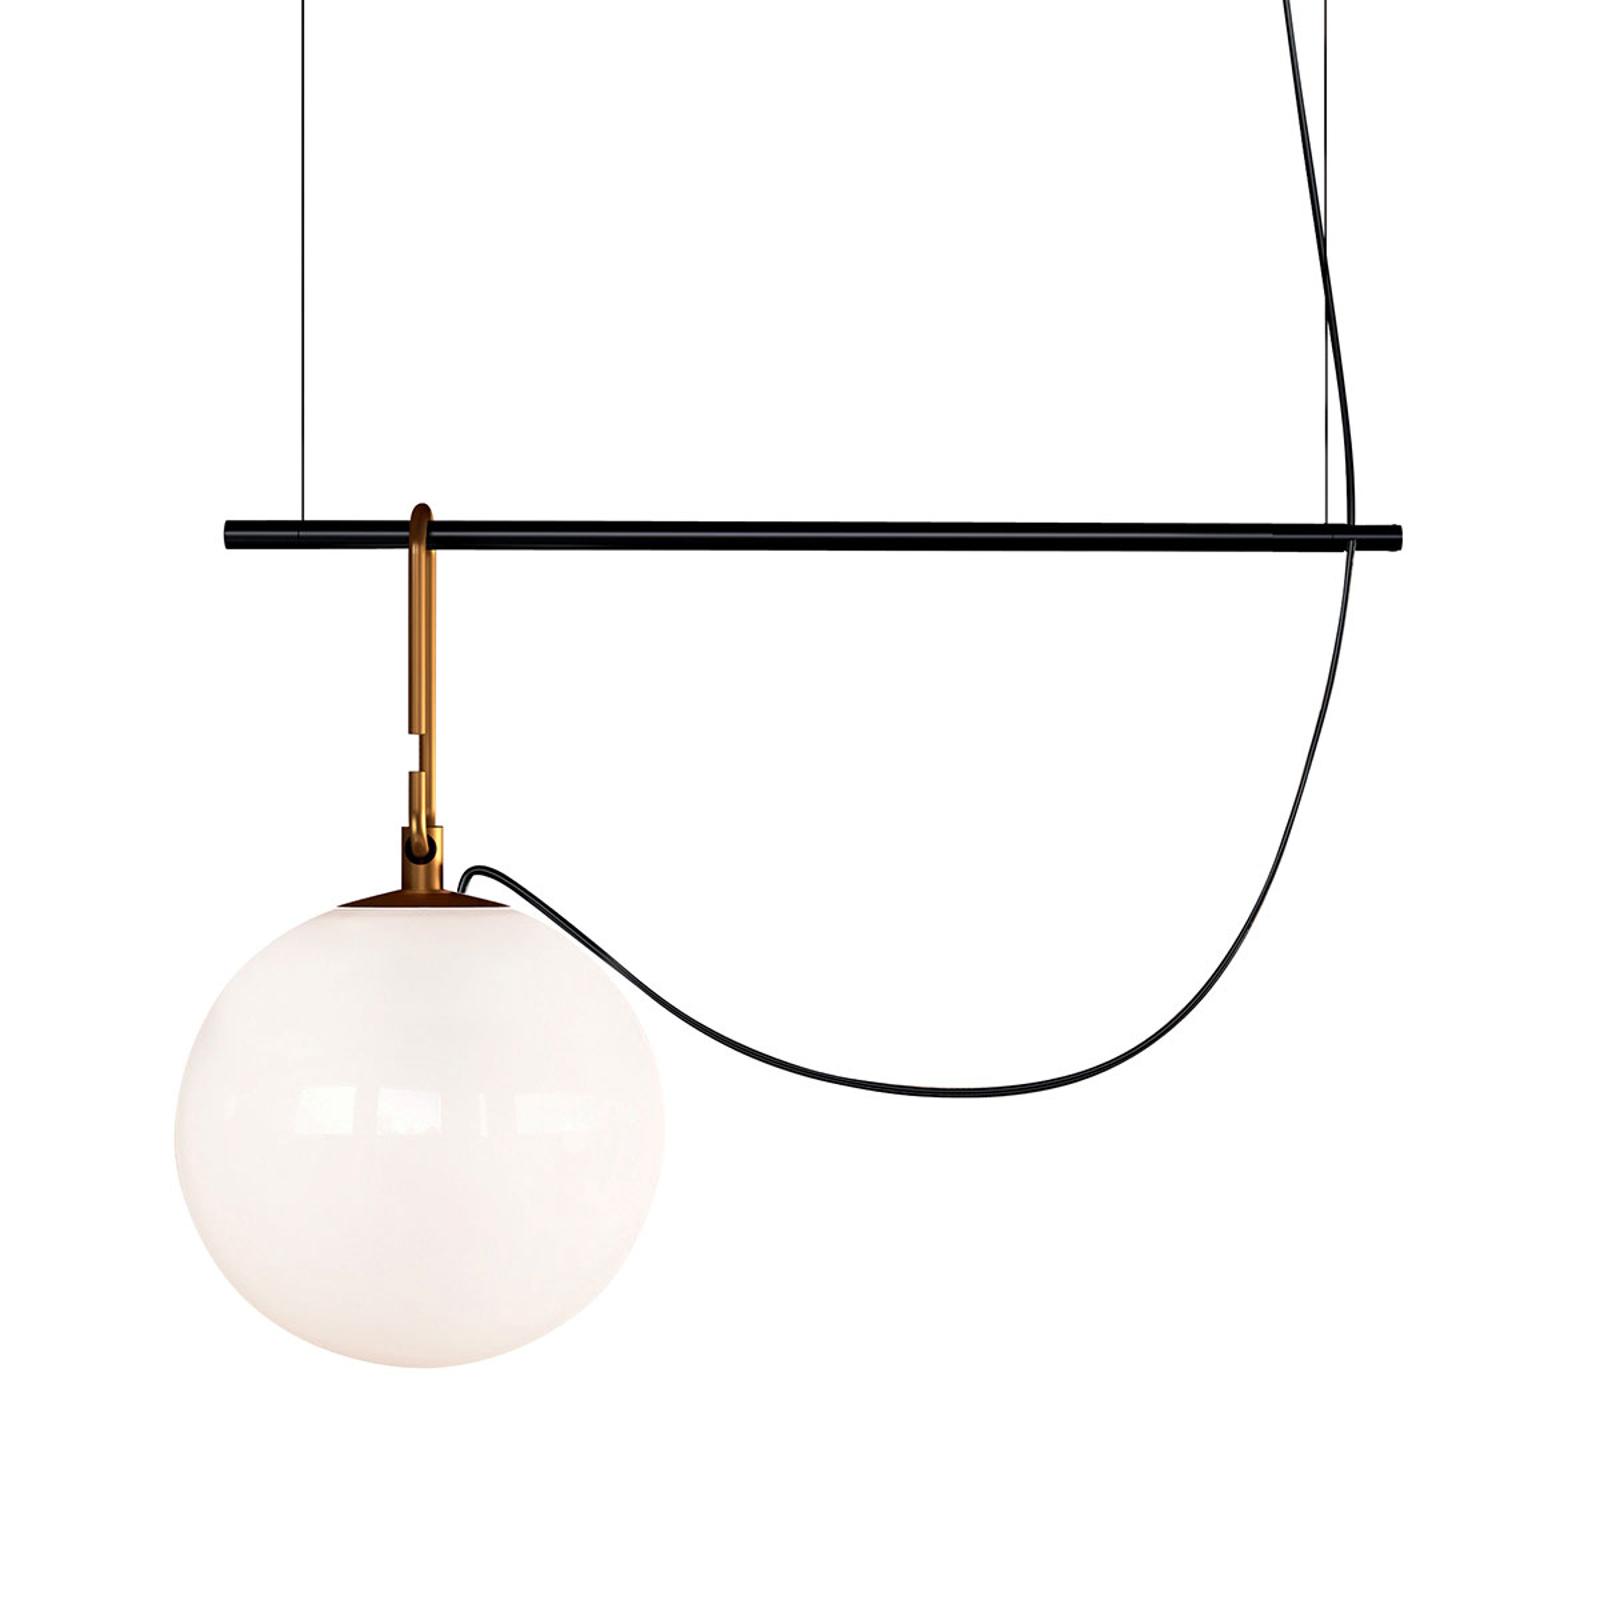 Artemide nh S1 22 hanglamp 55 cm bol Ø 22cm